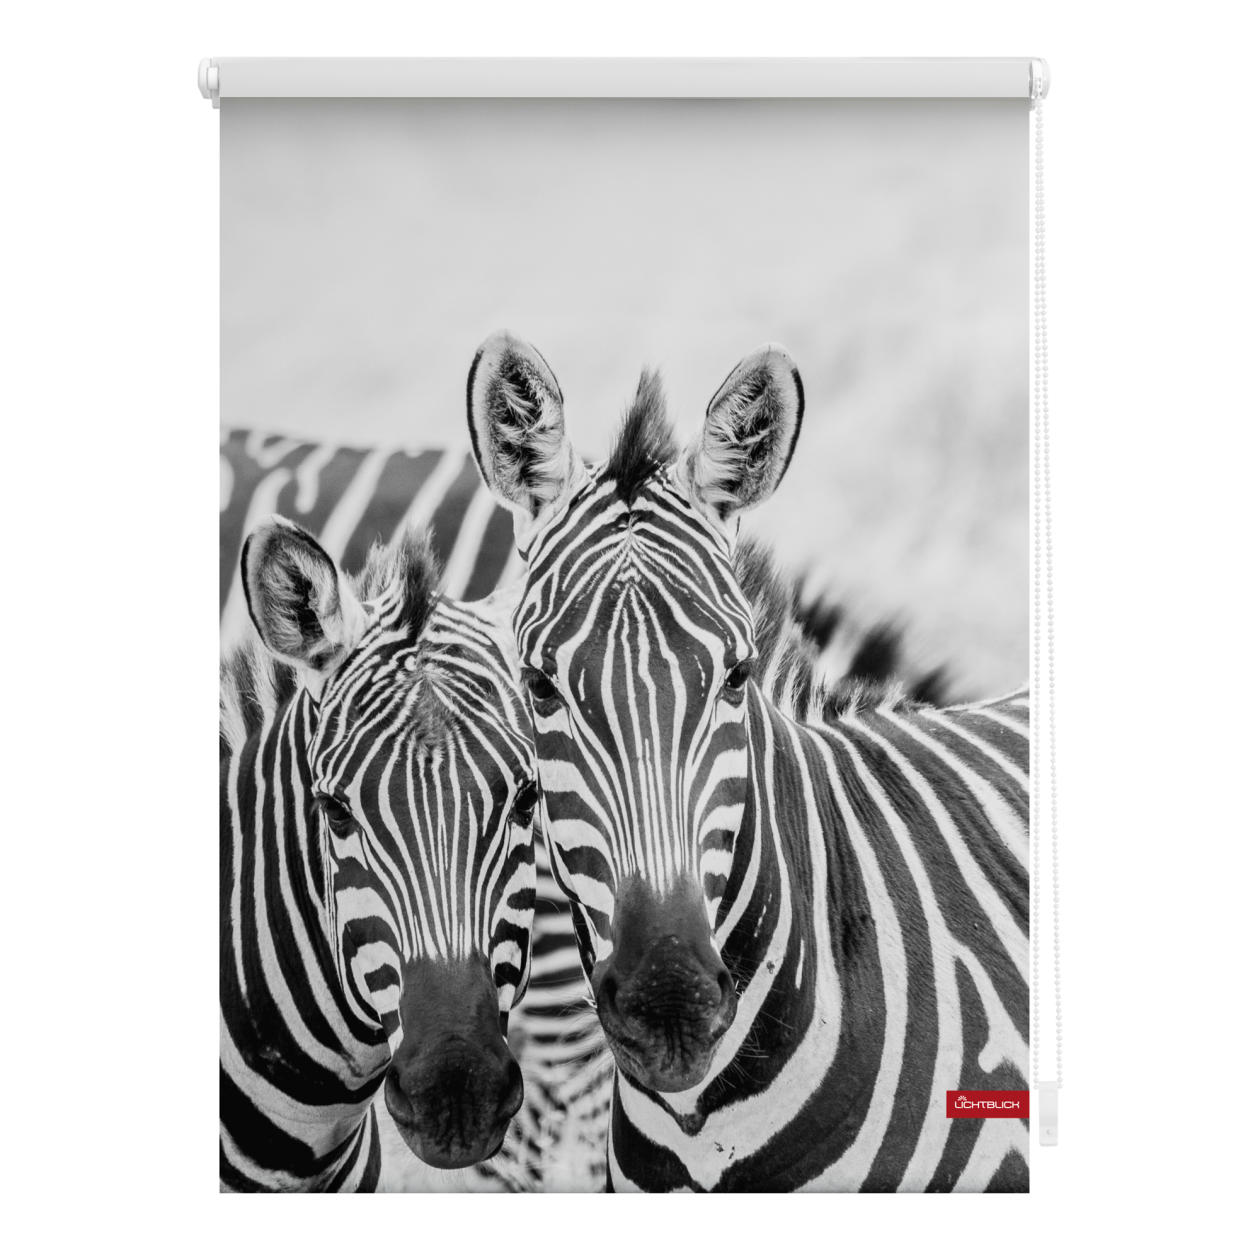 rollo klemmfix ohne bohren blickdicht zebra wei t rkis lichblick shop. Black Bedroom Furniture Sets. Home Design Ideas